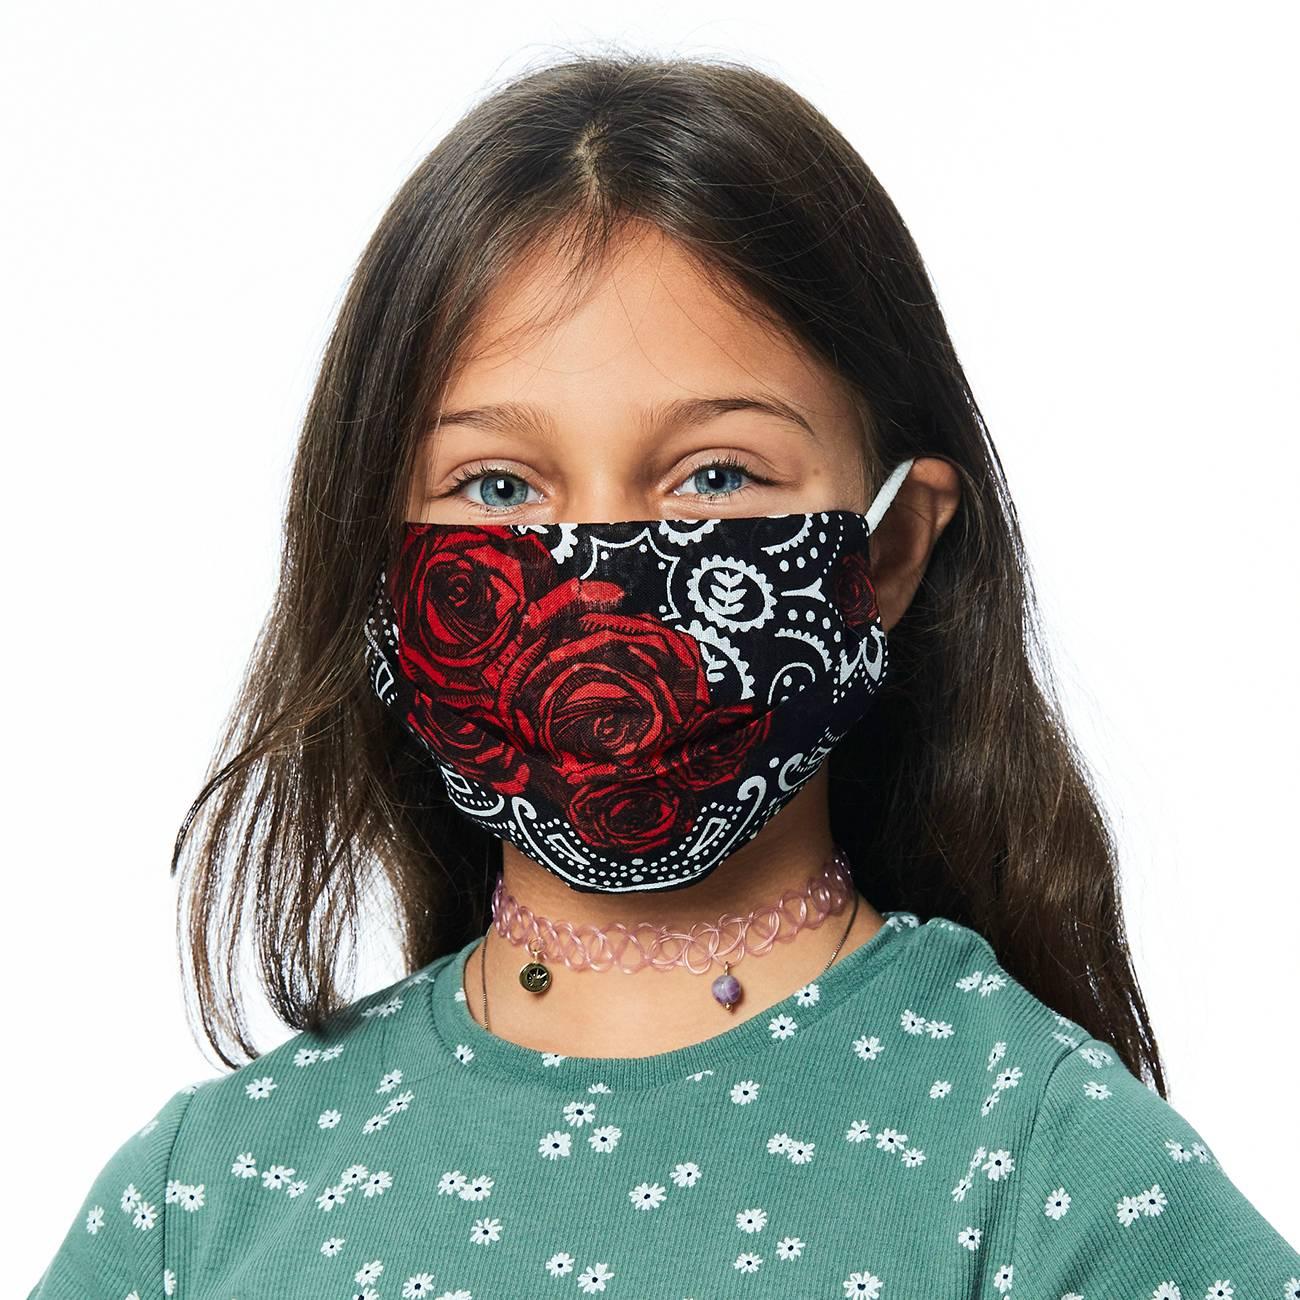 Masca Pm2.5 Trandafirii - Kids Xs Be Aware imagine 2021 bestvalue.eu